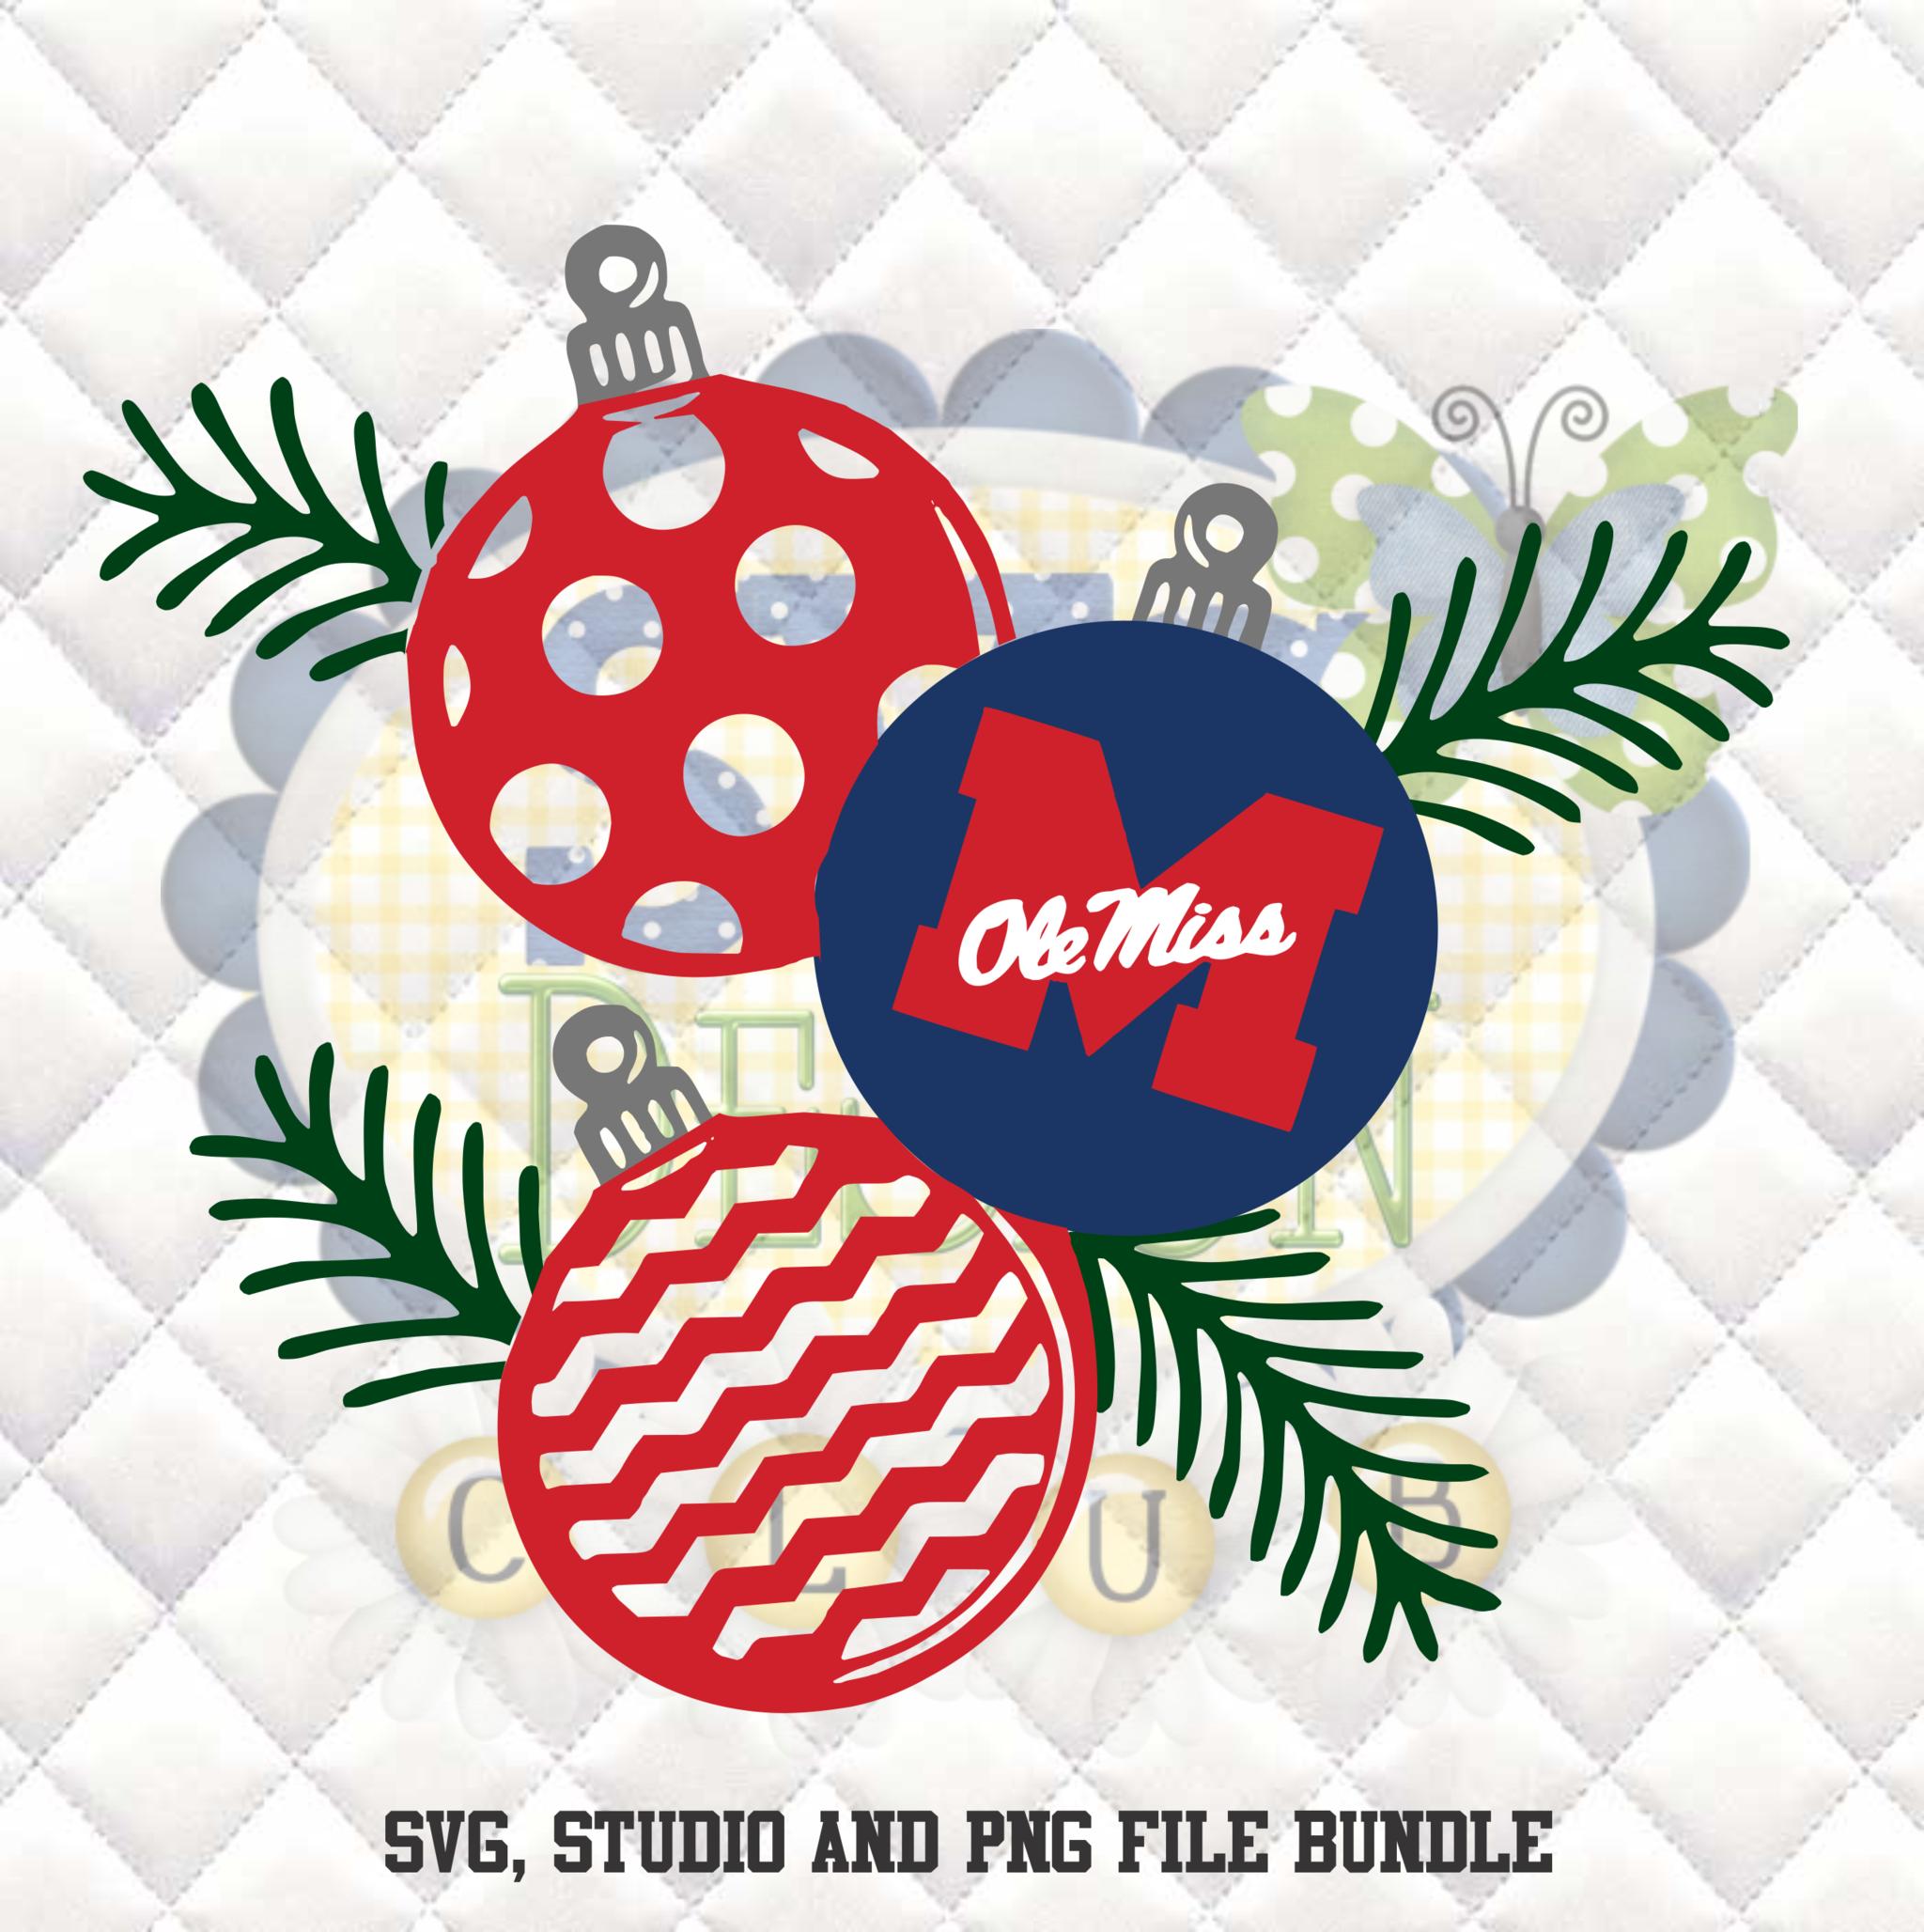 Ole Miss Rebels Christmas Ornaments Svg Silhouette Studio Bundle Design Download Christmas Svg Design Christmas Designs Christmas Svg